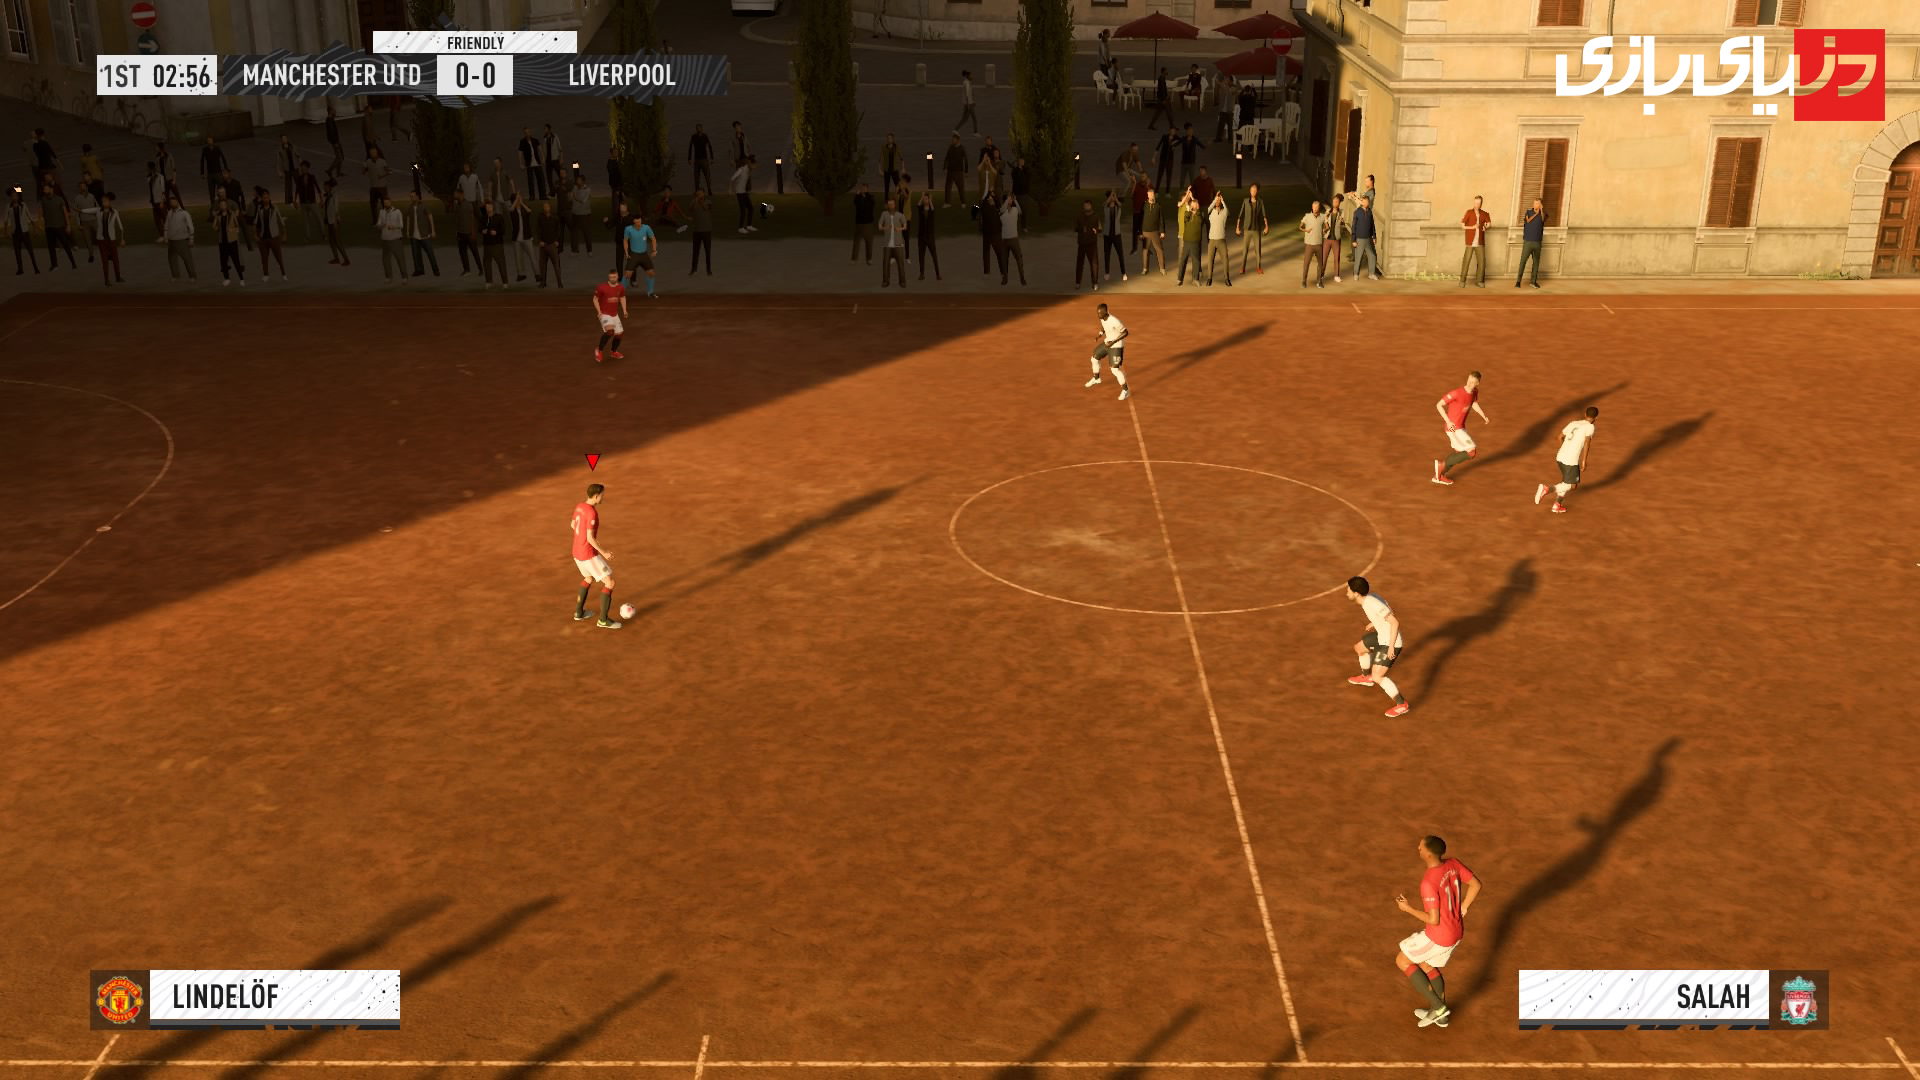 بخش فوتبال خیابانی بازی فیفا 2020